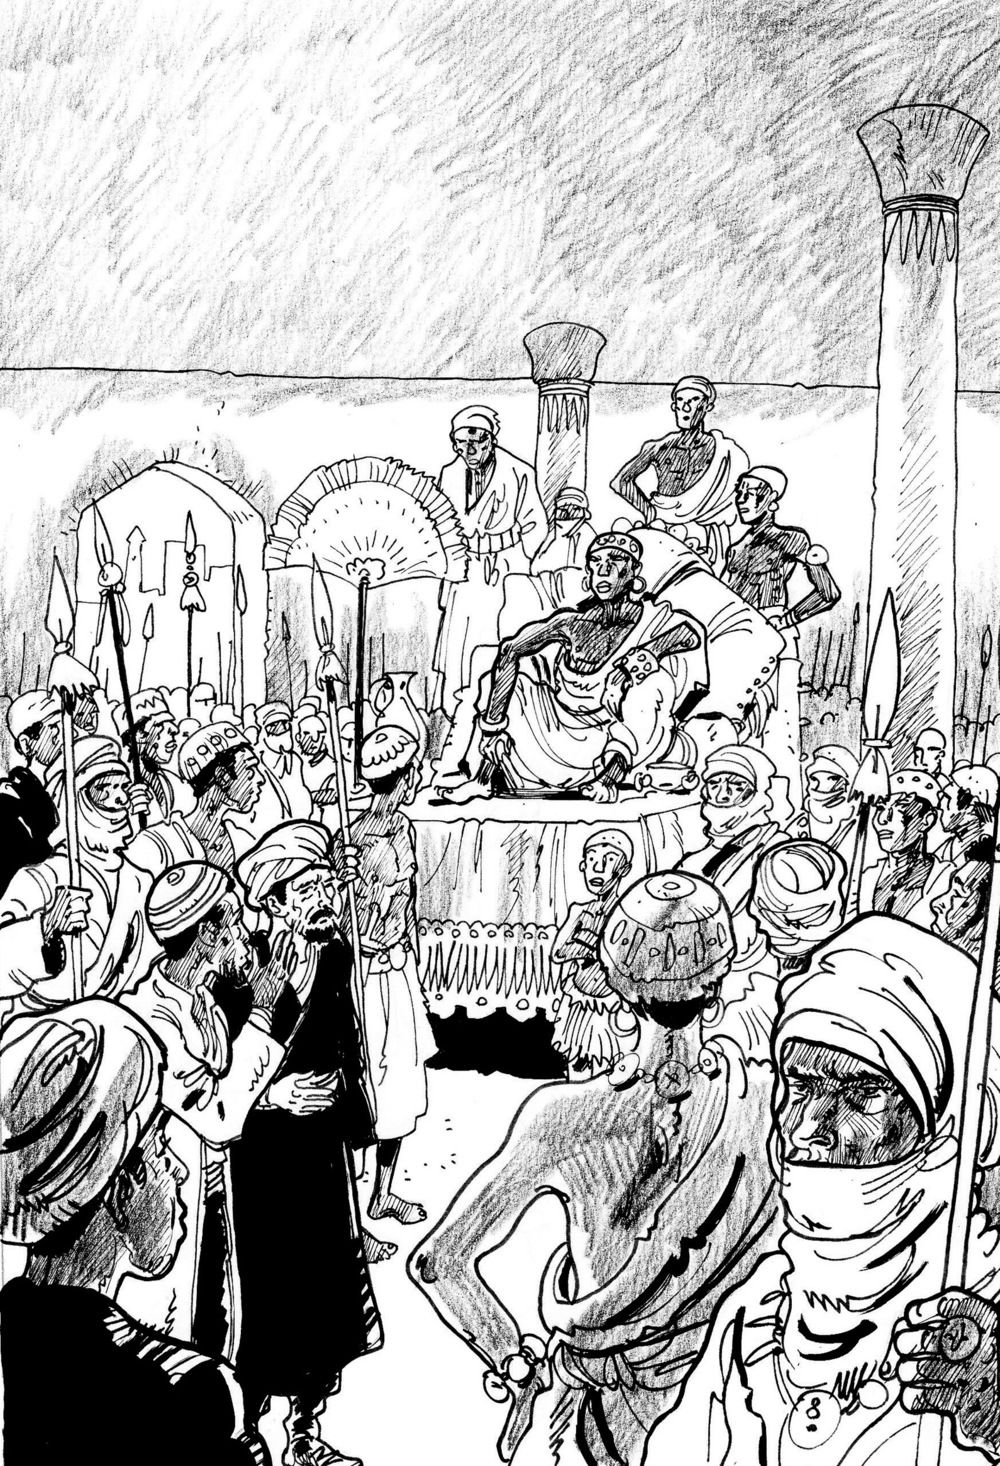 Black and white illustration for graphic novel about Ibn Battuta